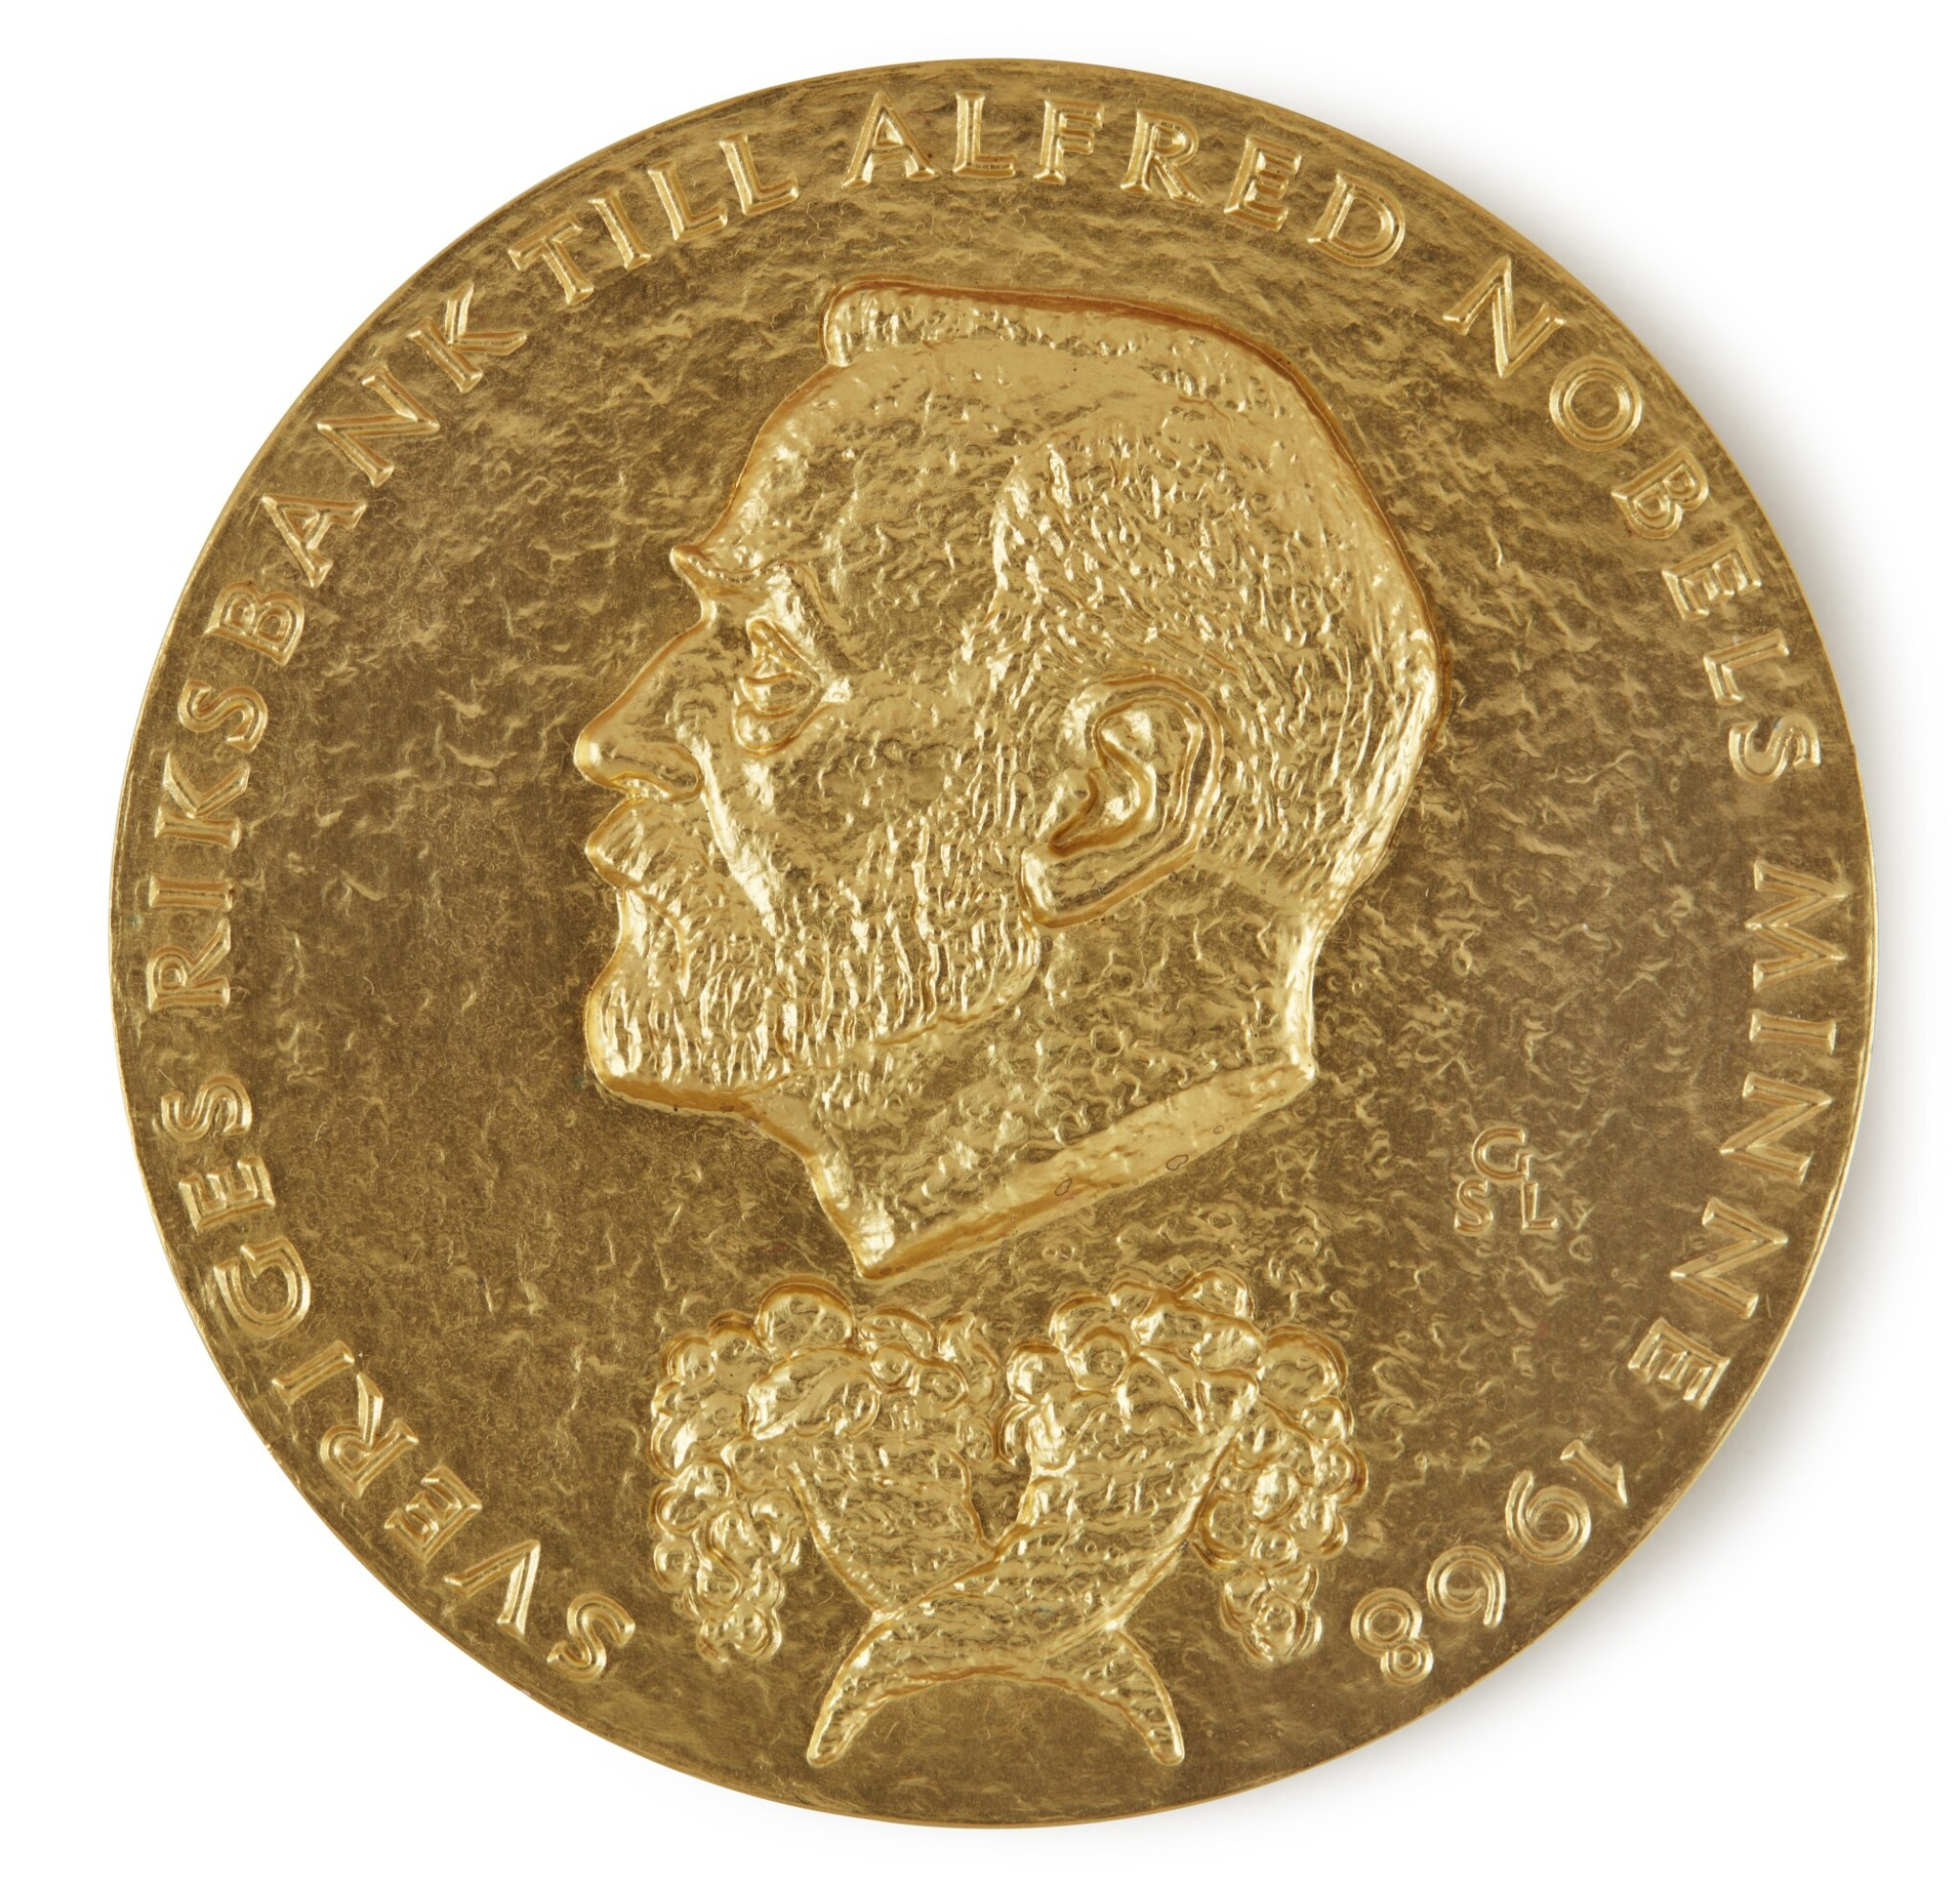 THE SVERIGES RIKSBANK PRIZE IN ECONOMIC SCIENCES IN MEMORY OF ALFRED NOBEL, 1974